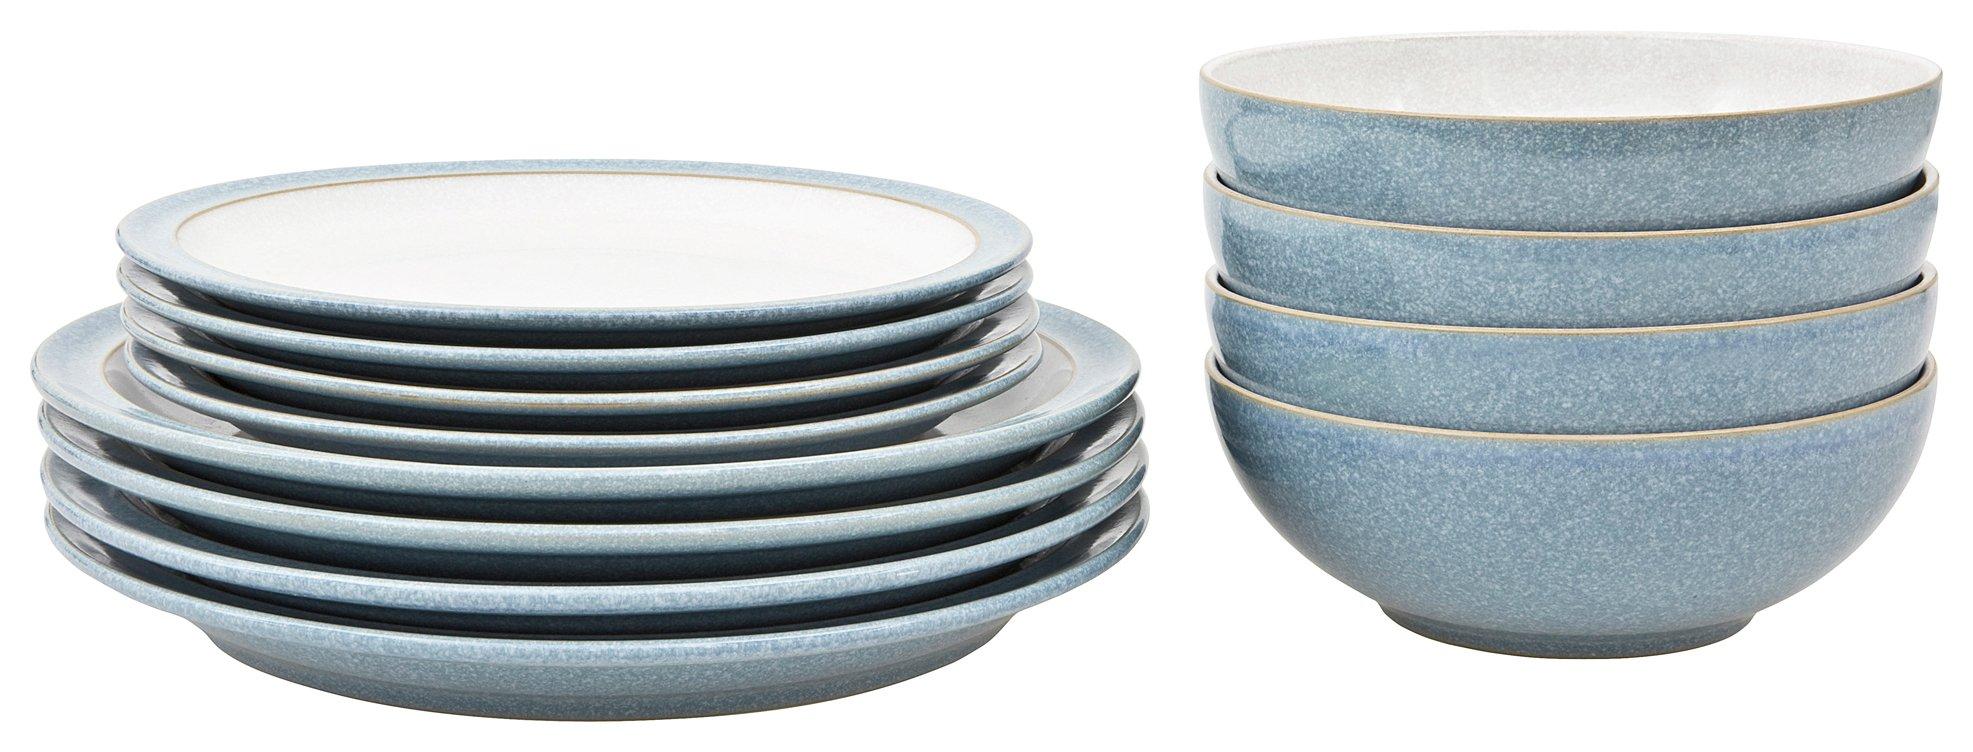 Denby Elements 12 Piece Ceramic Tableware - Blue